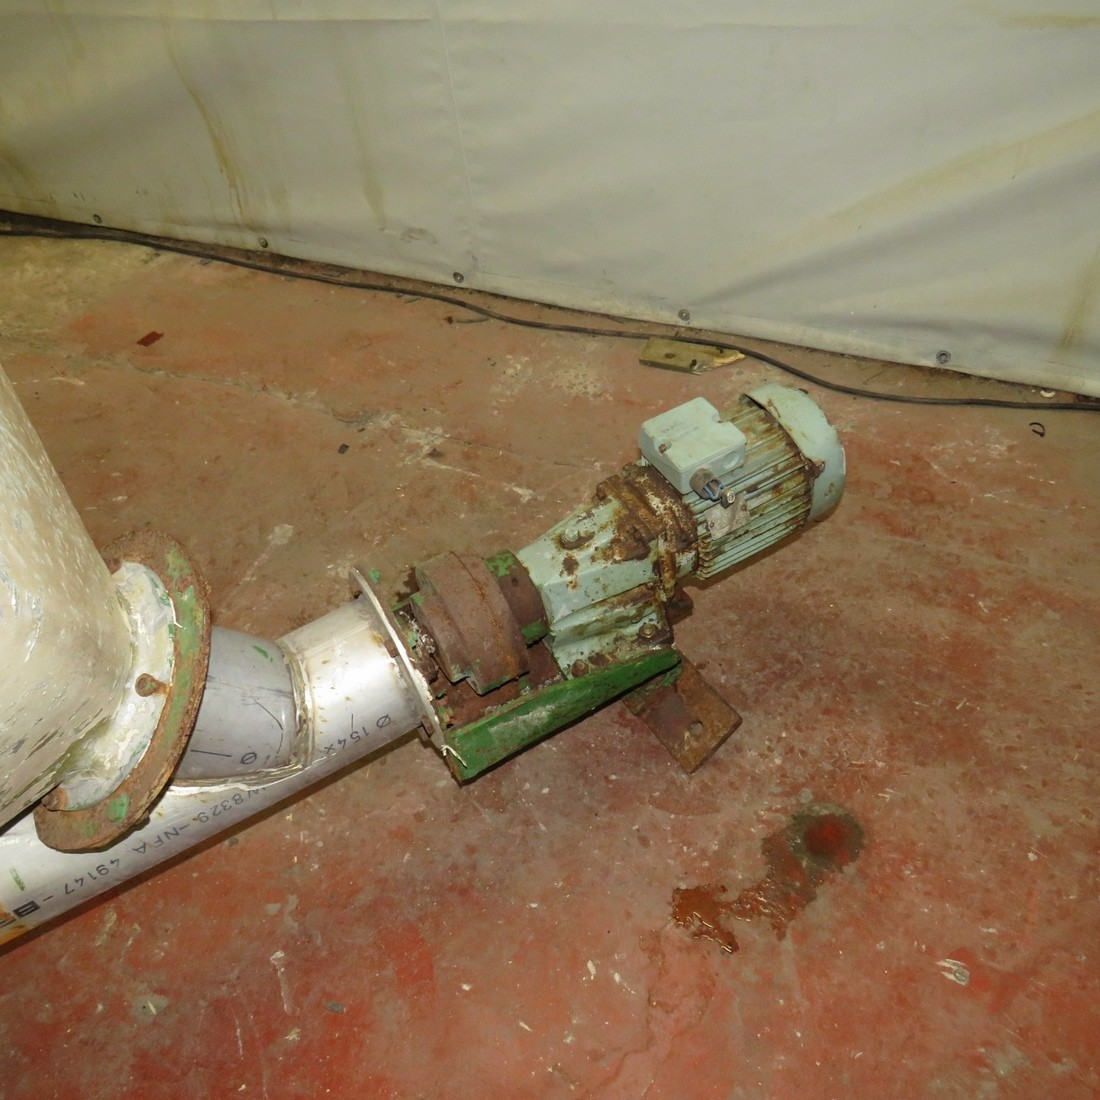 R4S1074  Stainless steel screw under tube 3900 mm